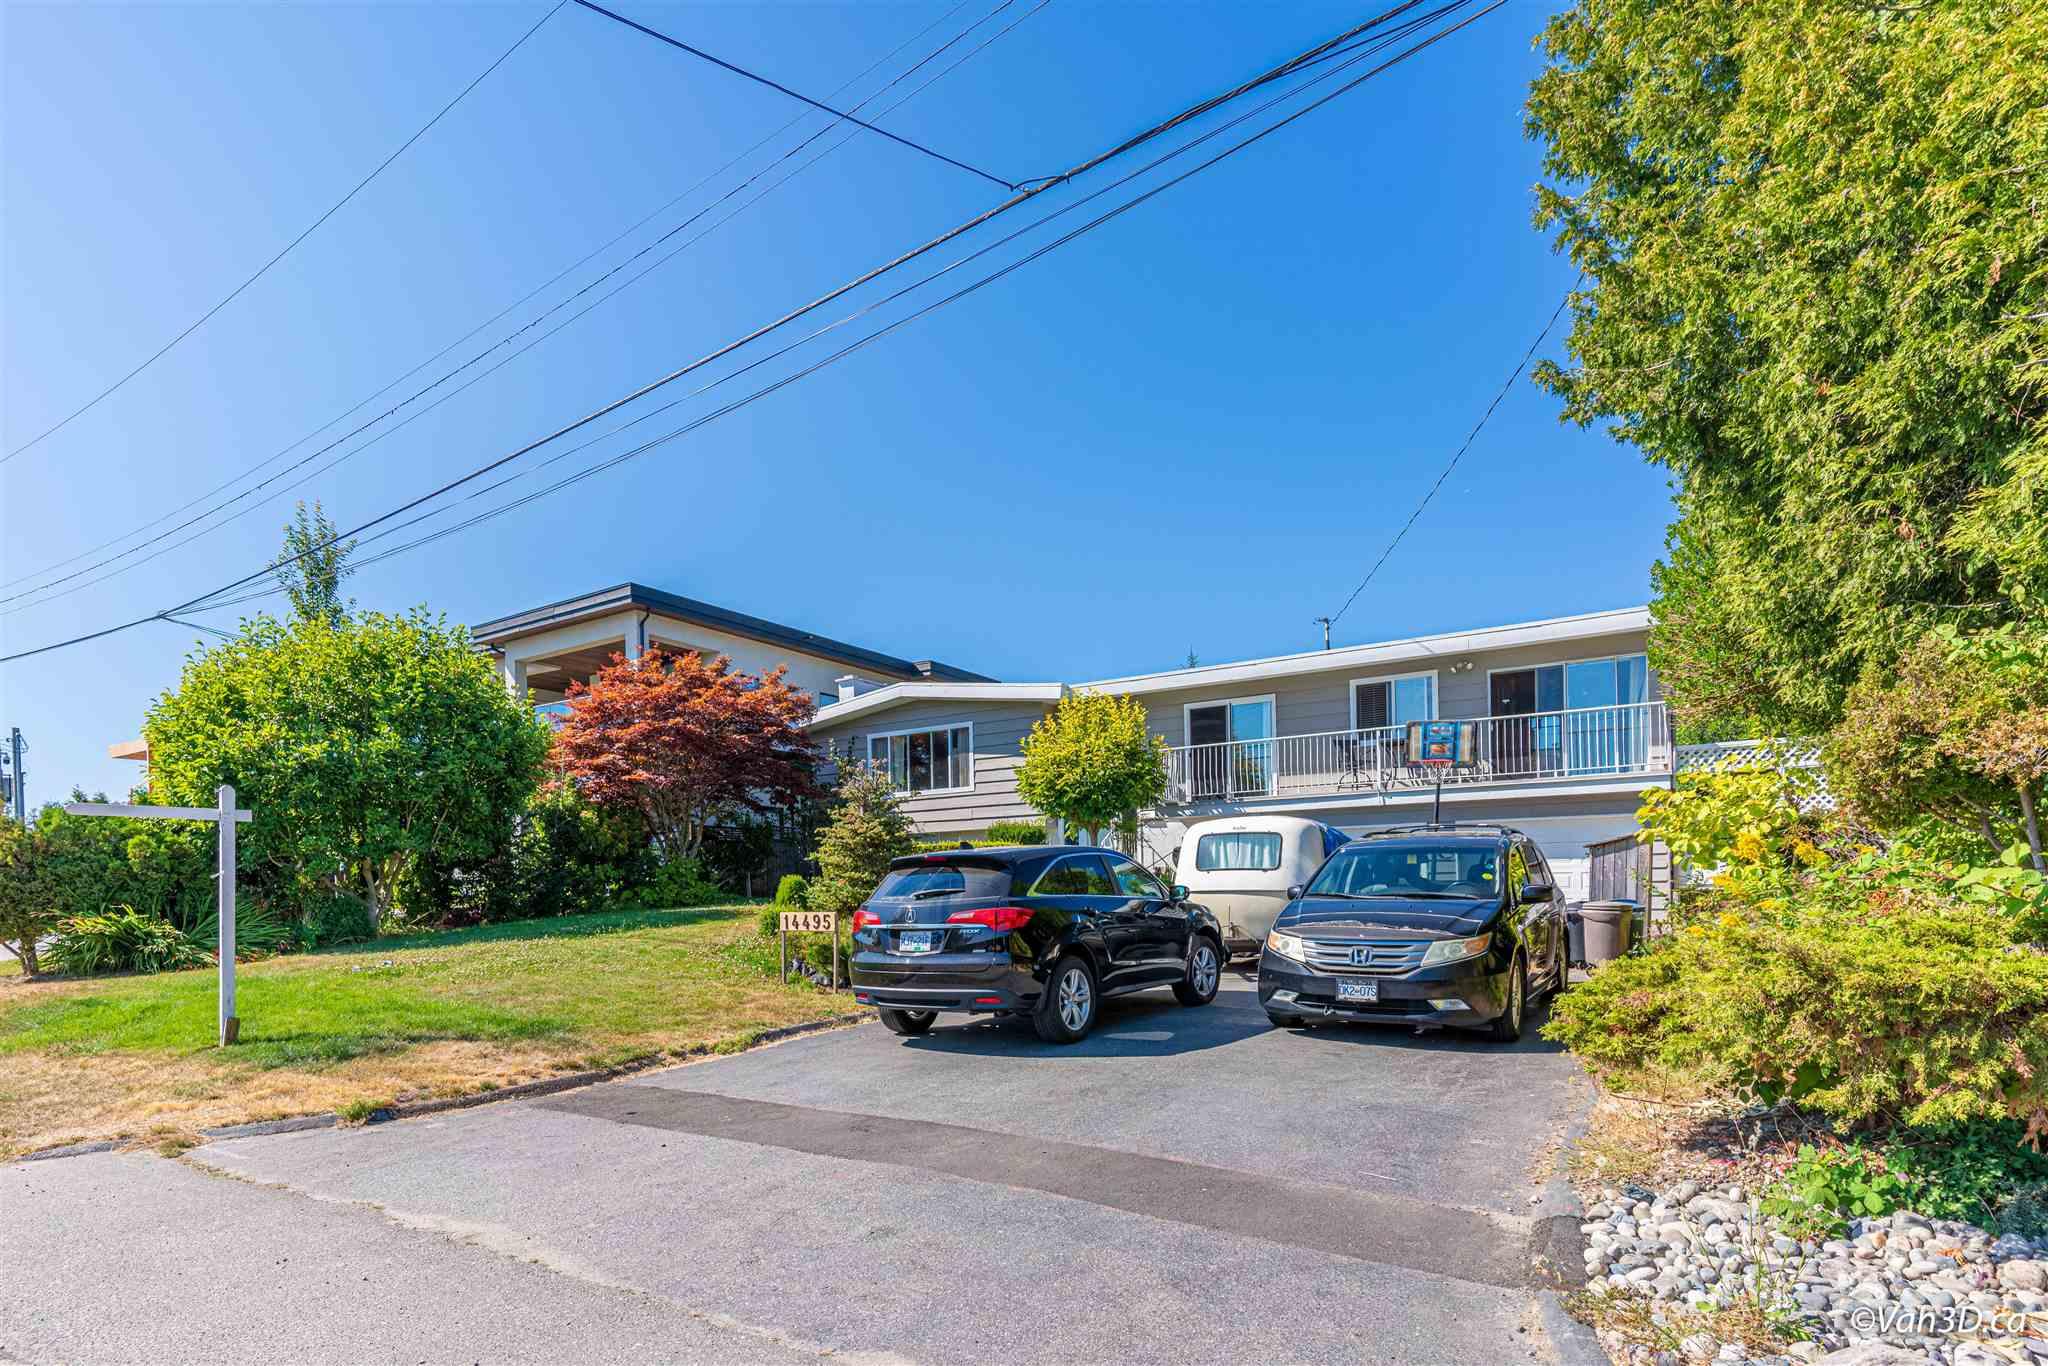 14495 MANN PARK CRESCENT - White Rock House/Single Family for sale, 4 Bedrooms (R2604561) - #2